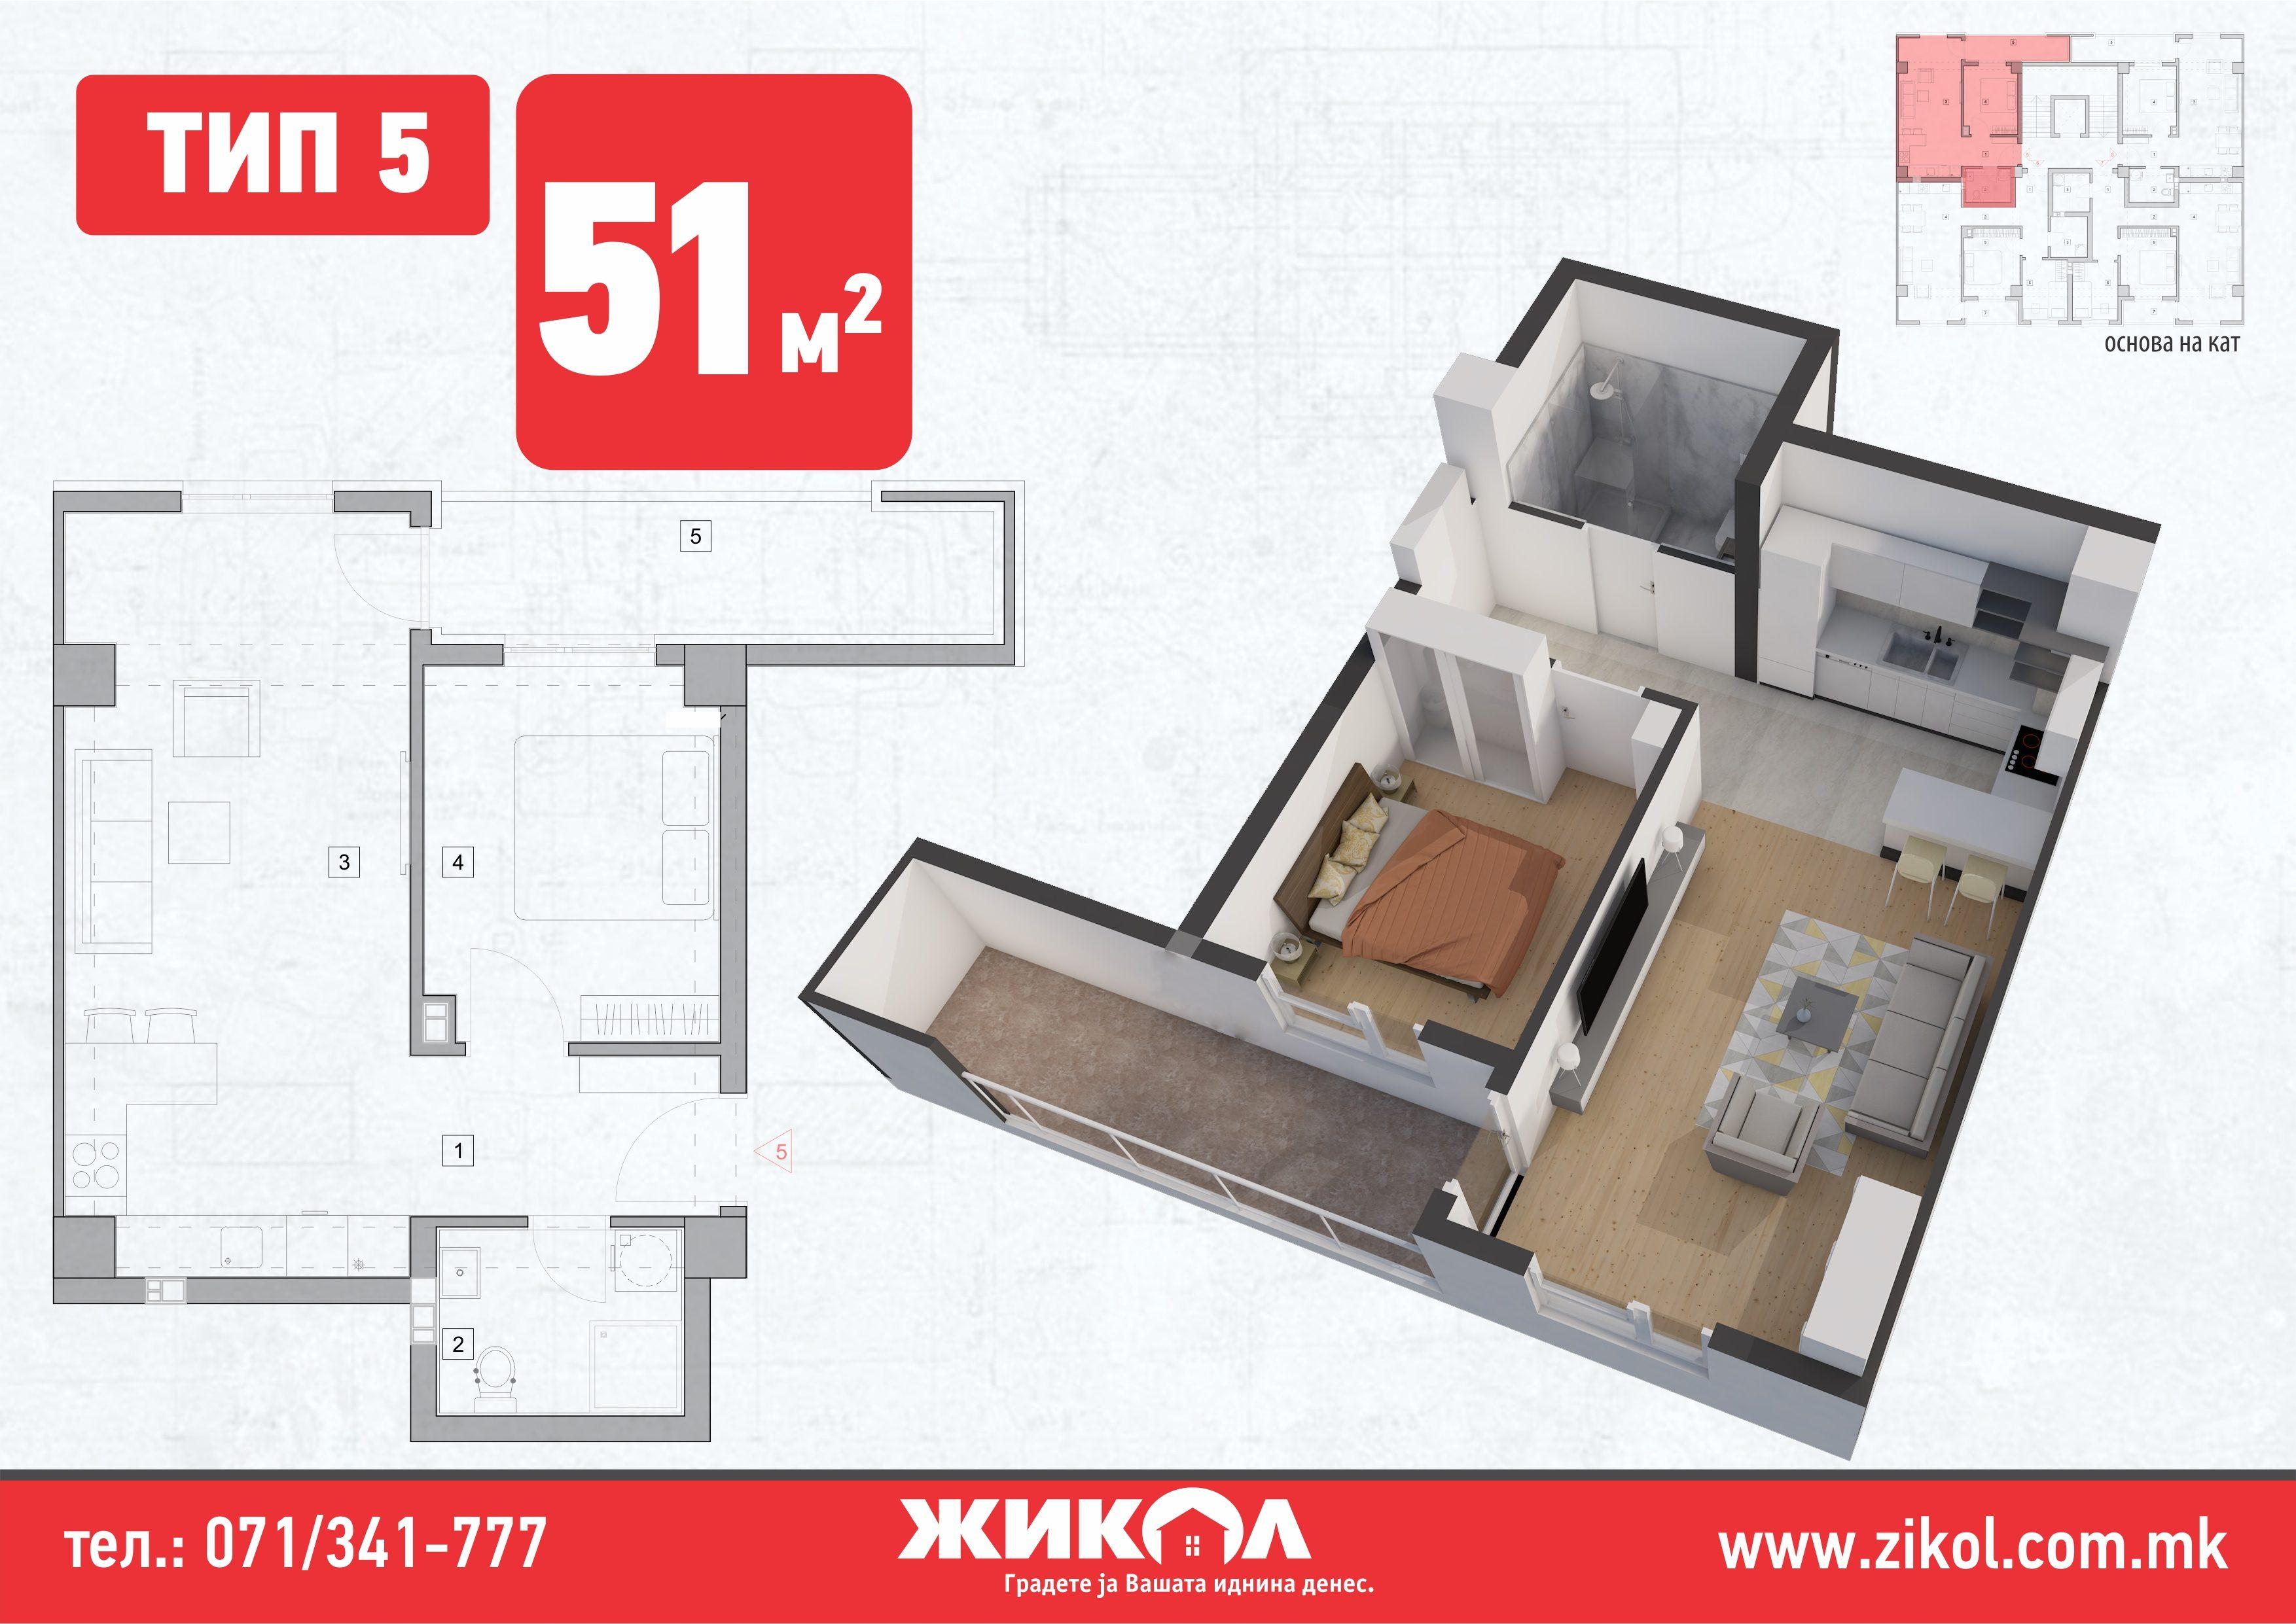 зграда 7, кат 4, стан 17